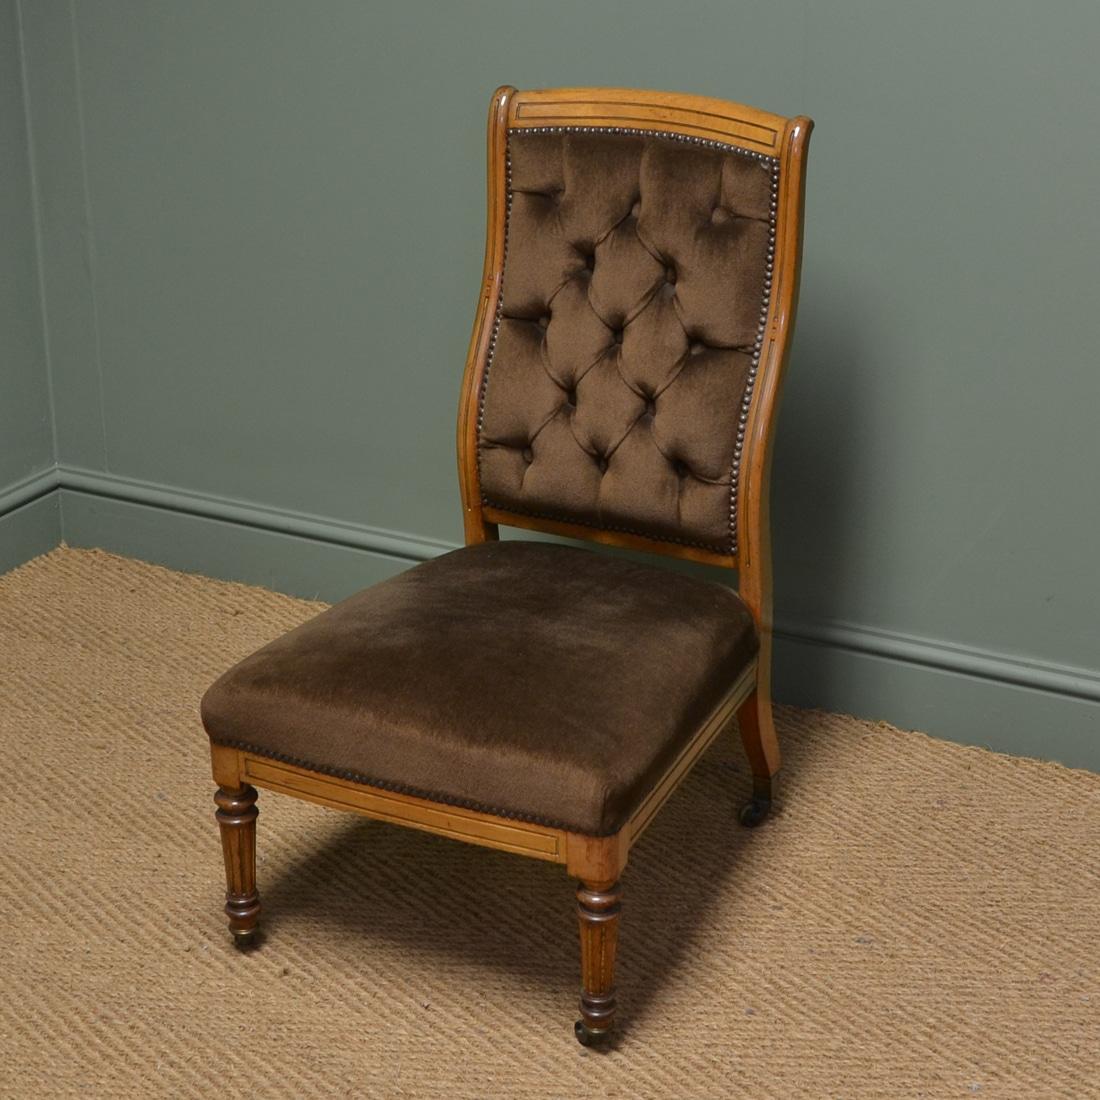 Quality Victorian Mahogany Antique Nursing Chair / Side Chair.